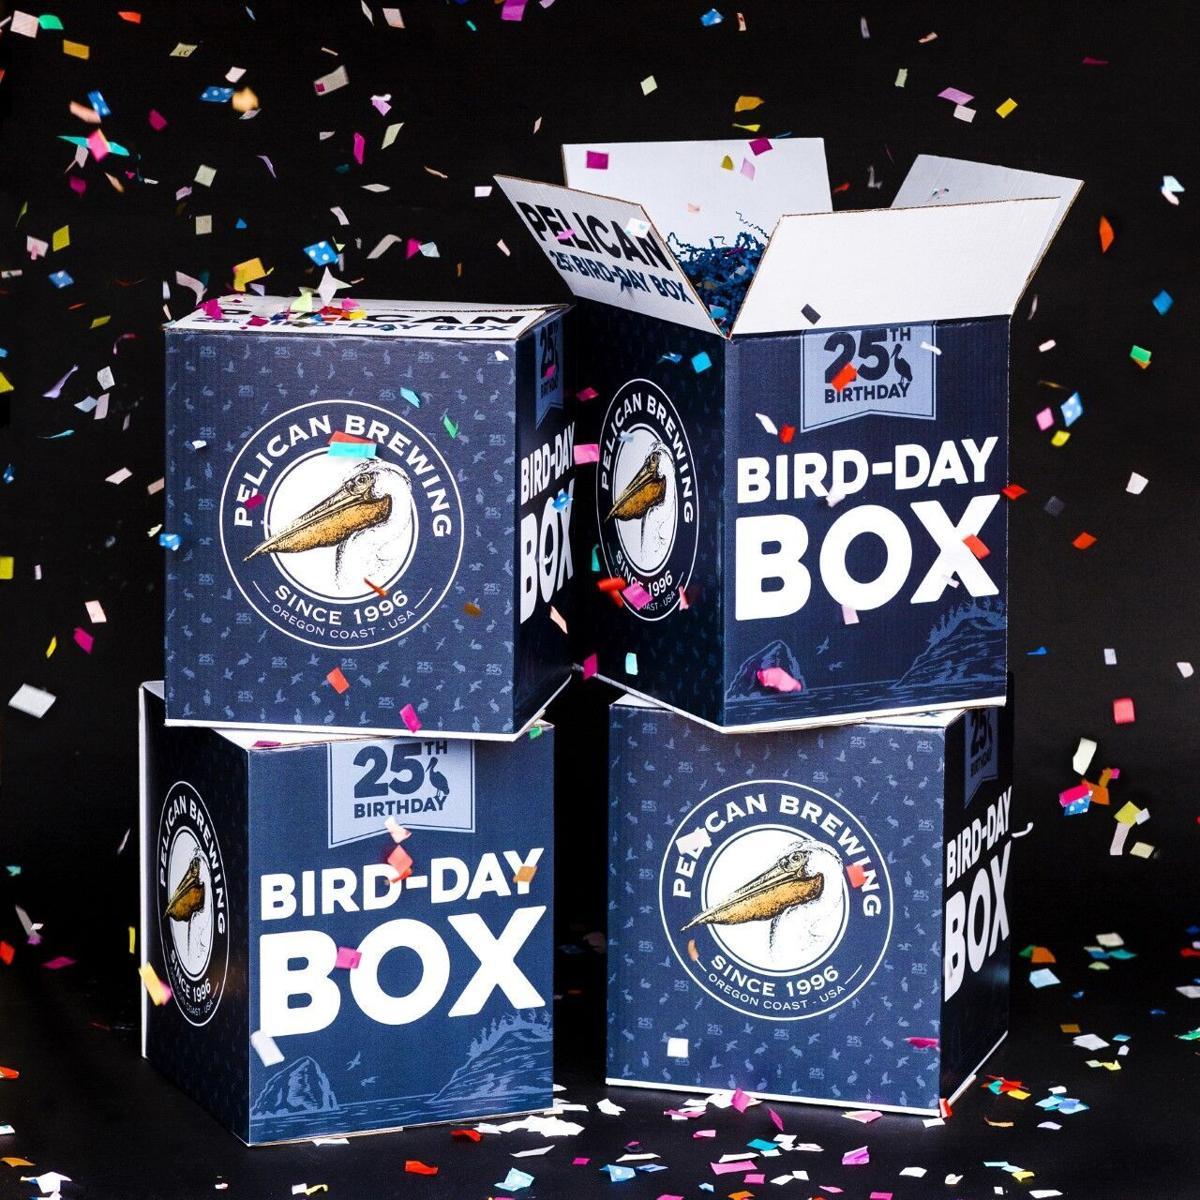 Bird-day box